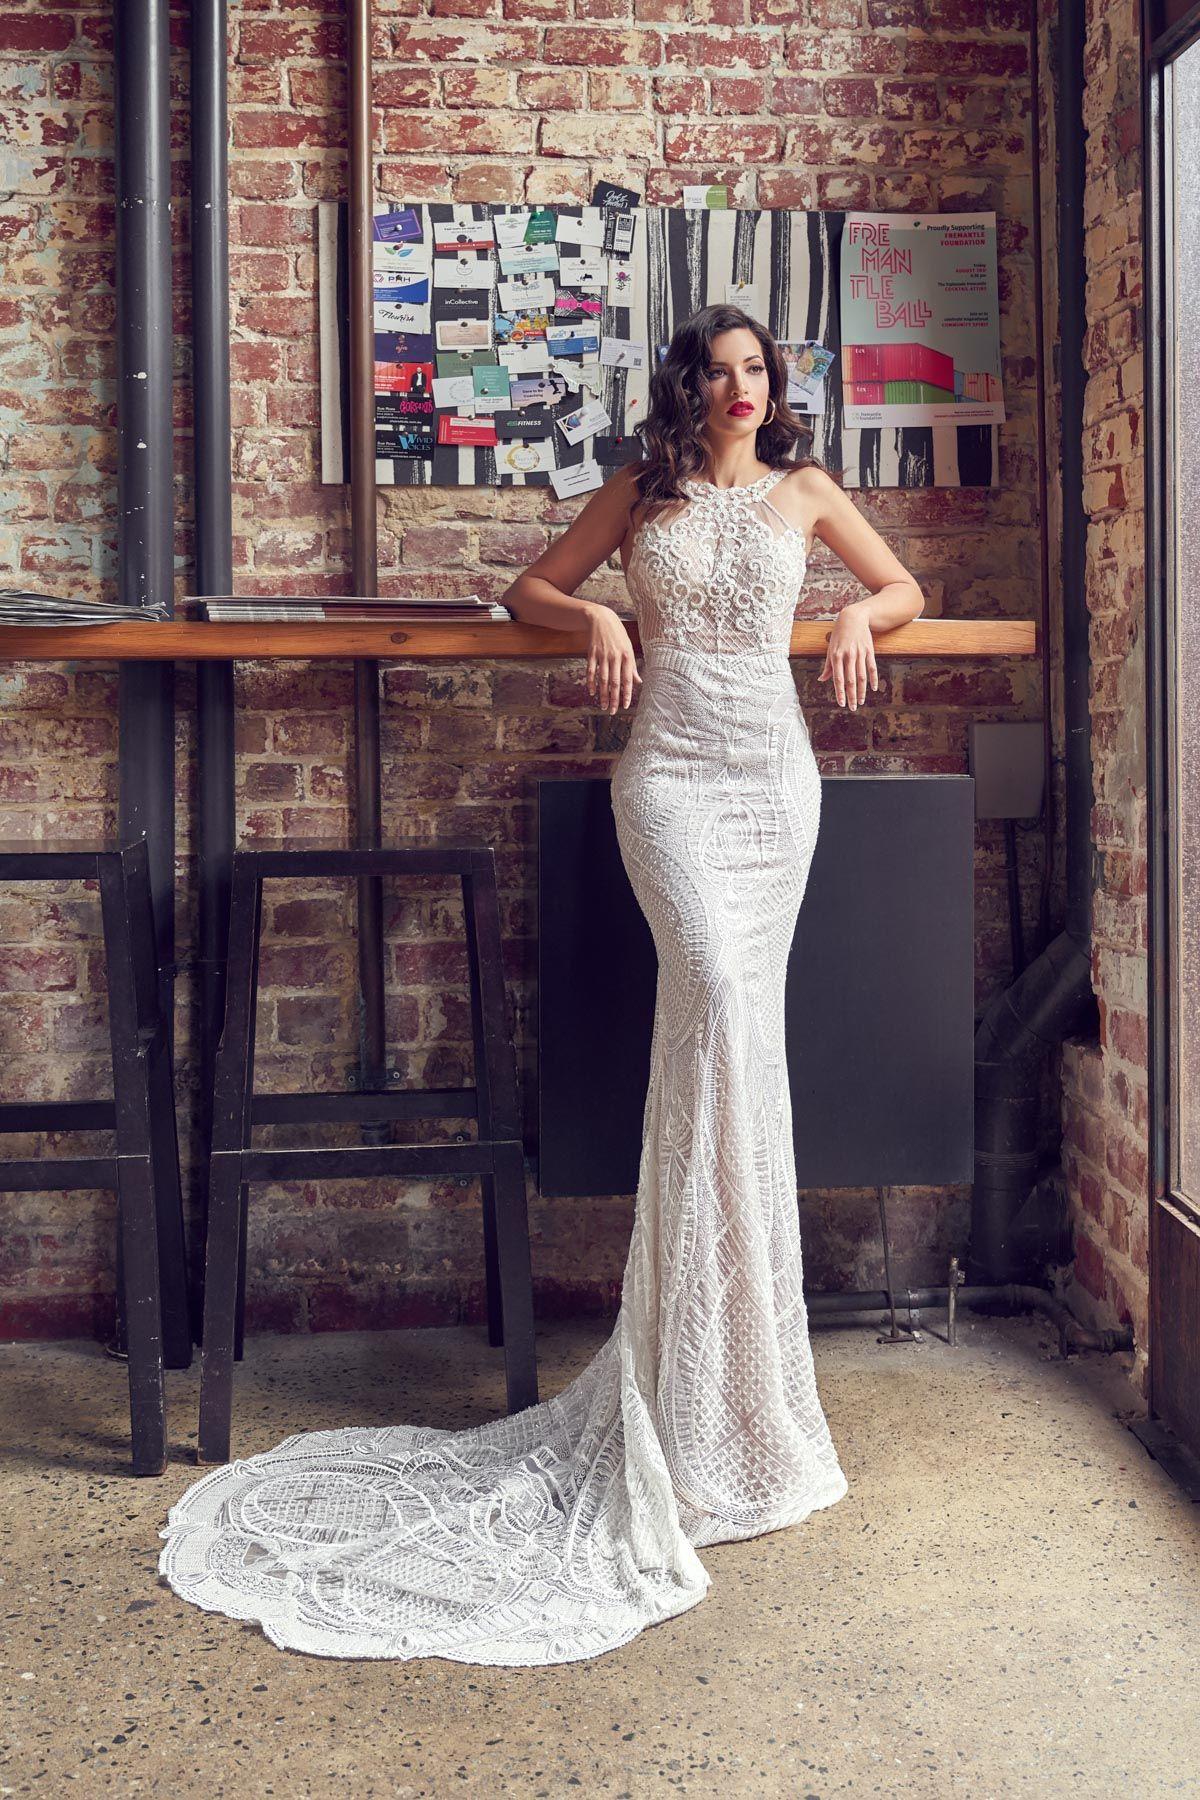 Zb 218 1z Wedding Dress Store Latest Bridal Dresses